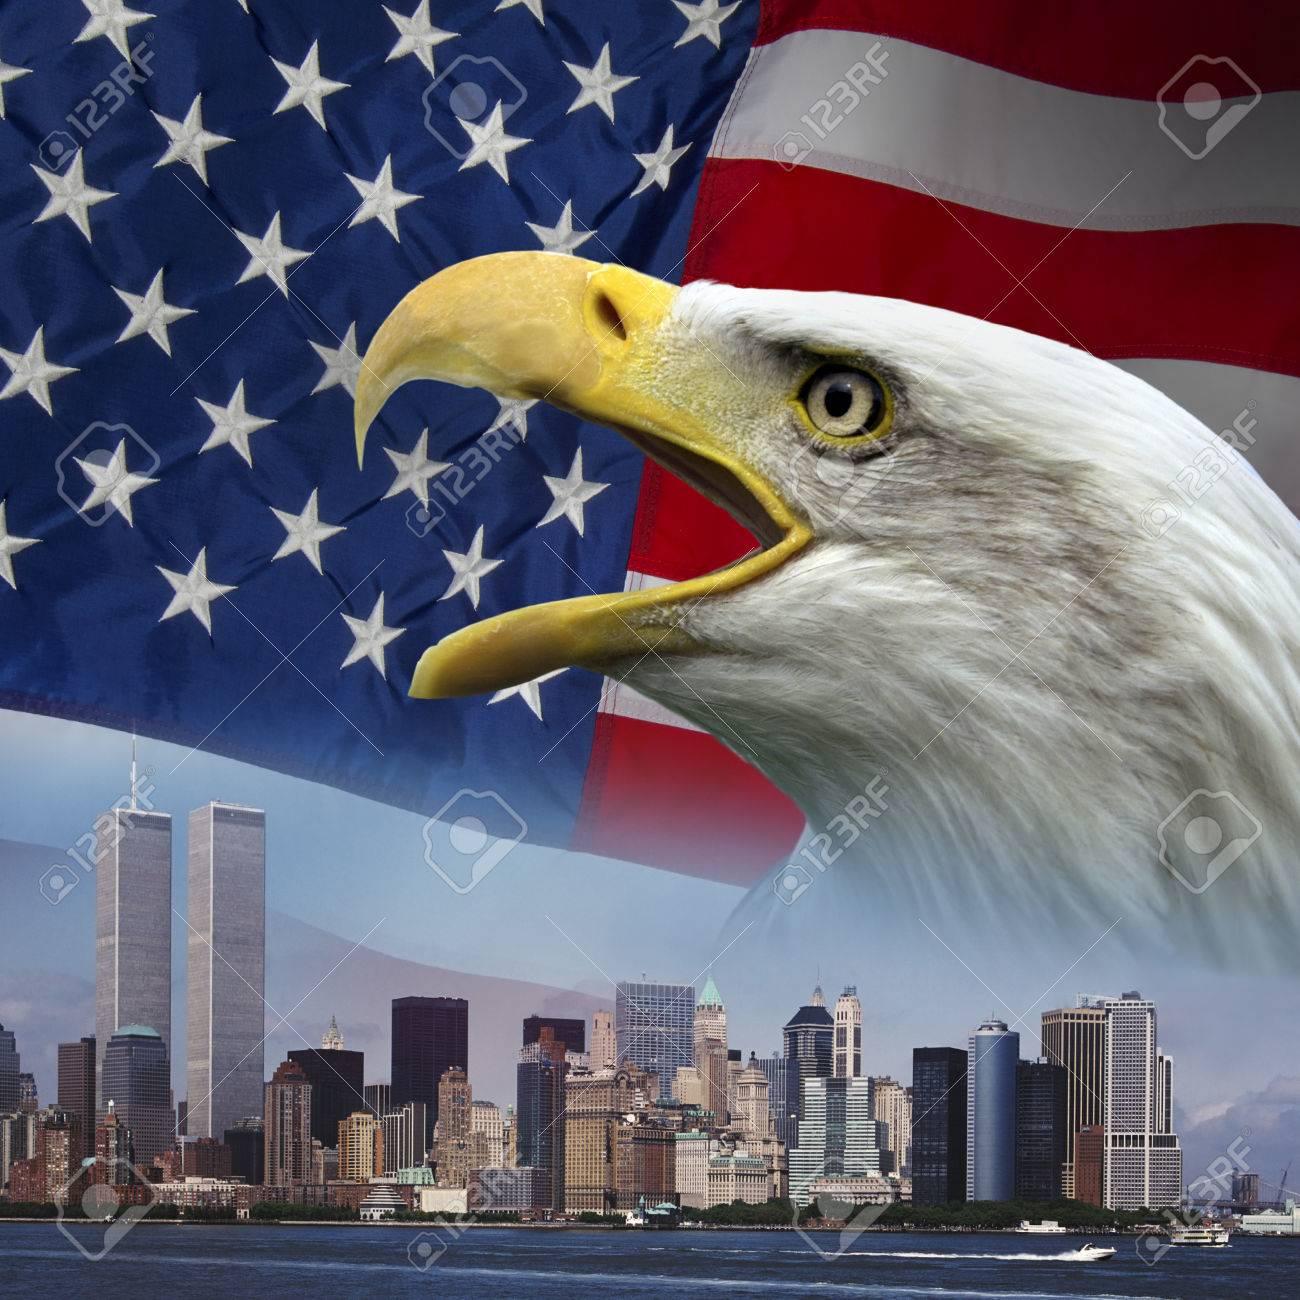 Patriortic symbols to remember 9-11 - 24528431